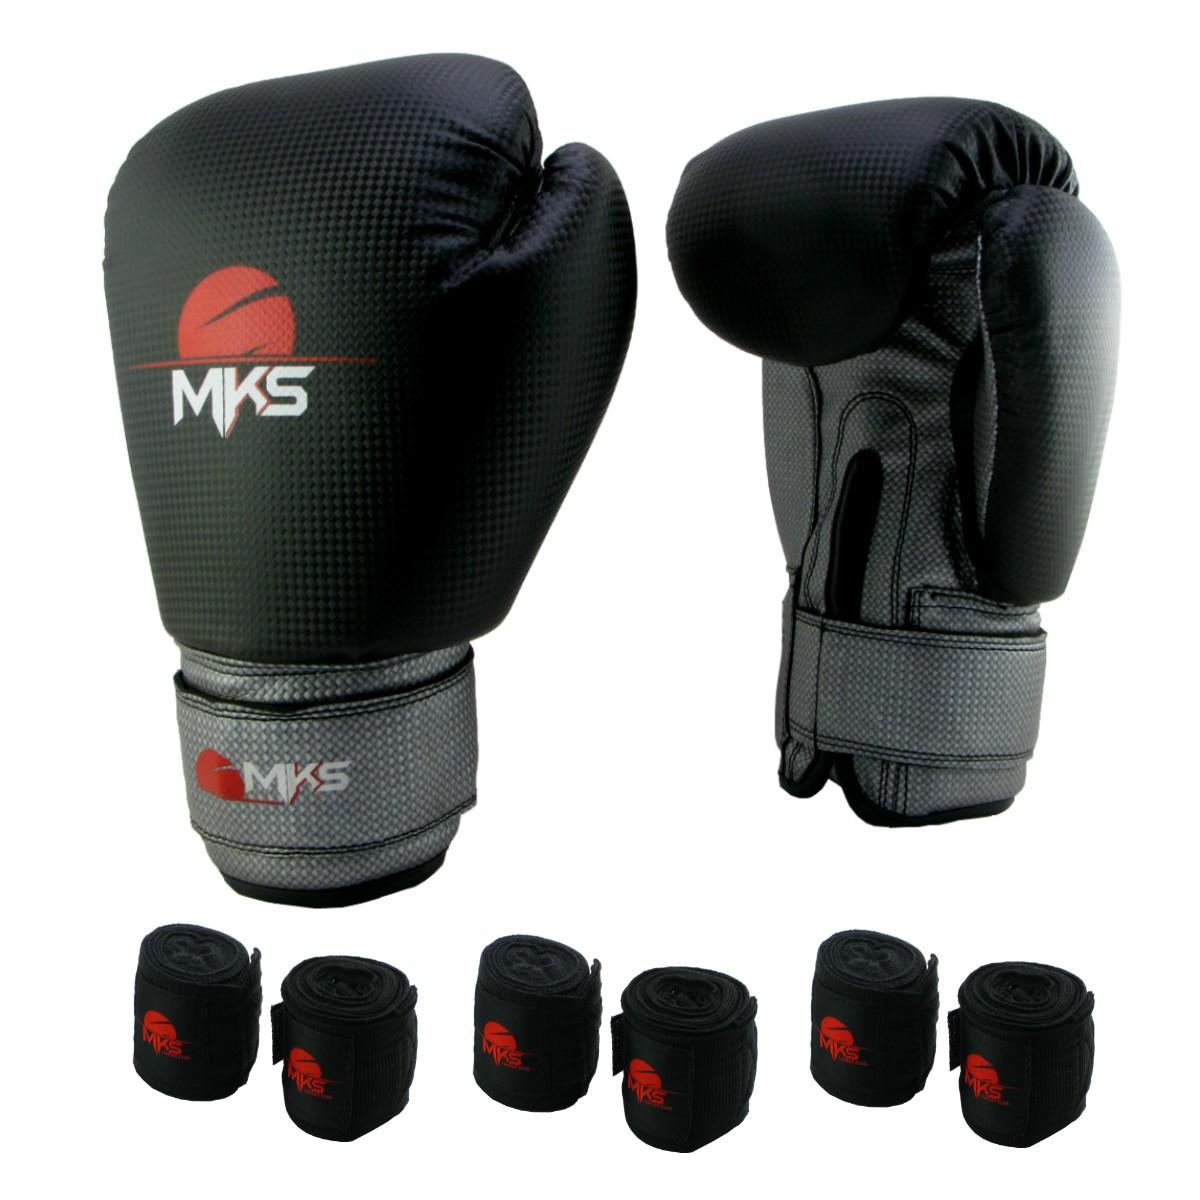 Luva de Boxe Prospect MKS Black & Silver 14 oz +  03 bandagem